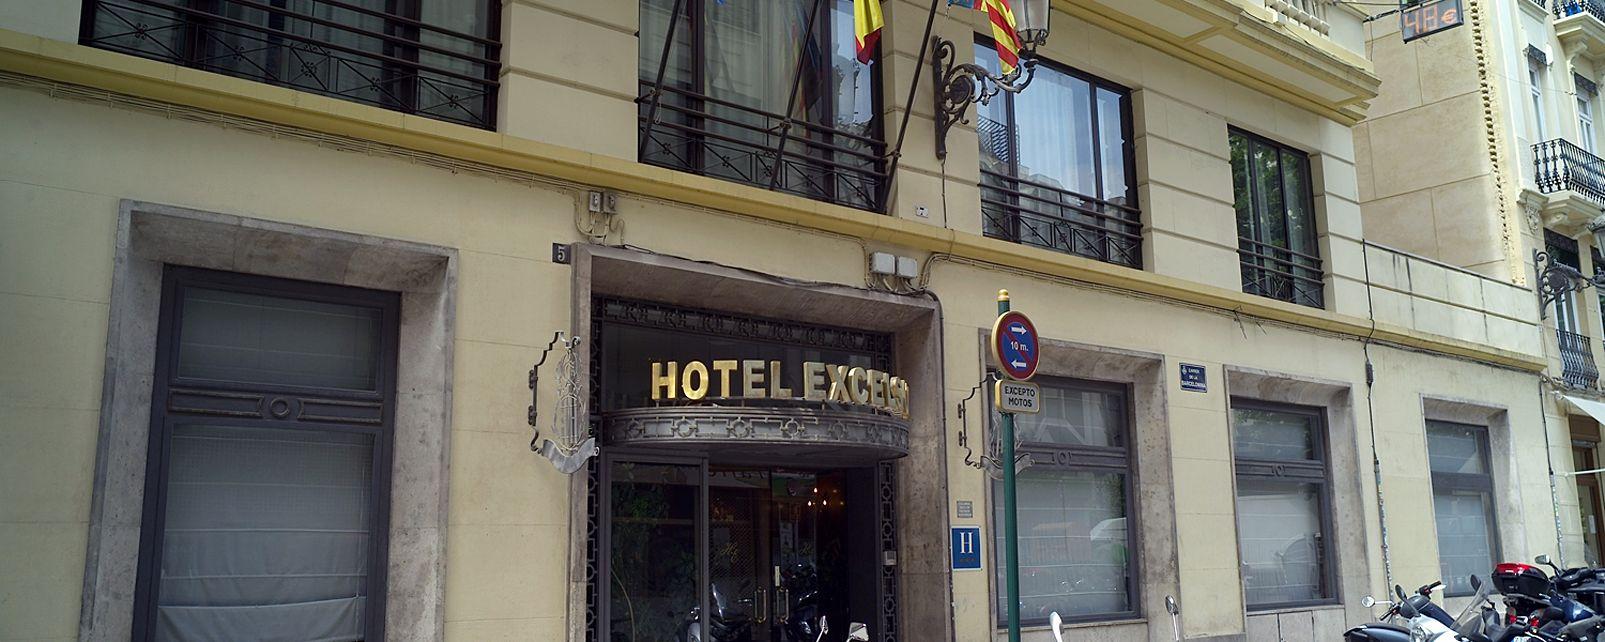 Hôtel Catalonia Excelsior Hotel